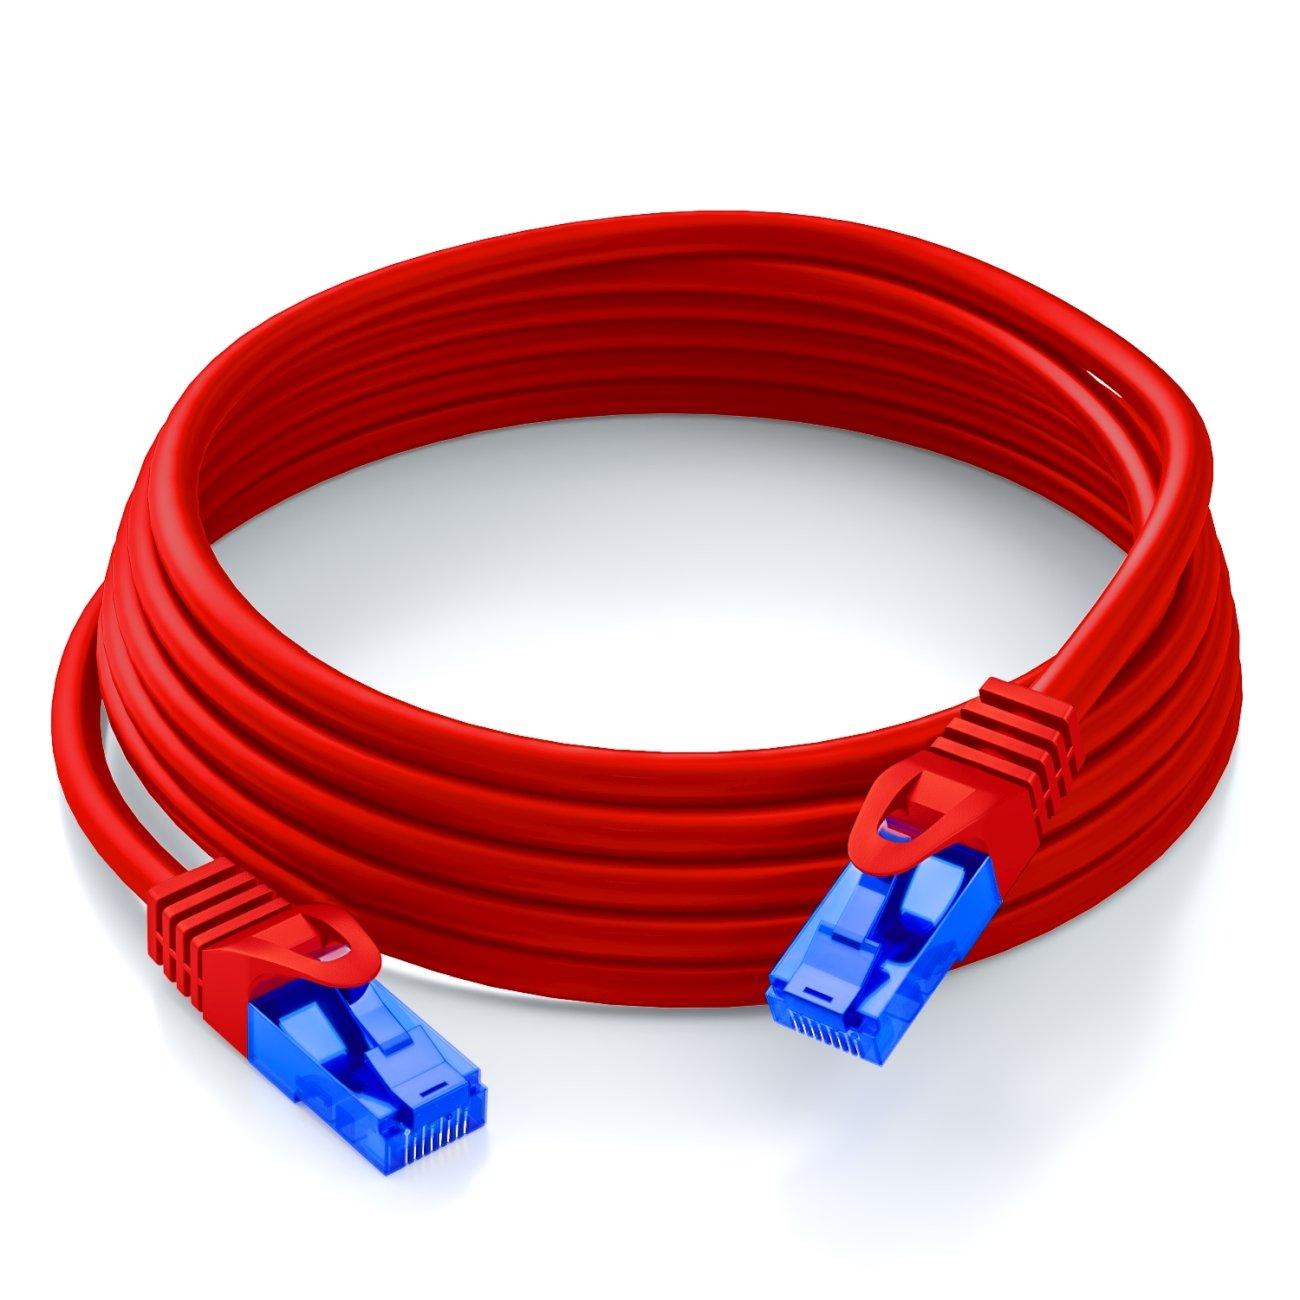 Cable de Red 3 m, Cat6, U//UTP , RMS45, RJ-45, Blanco UTP deleyCON MK1616